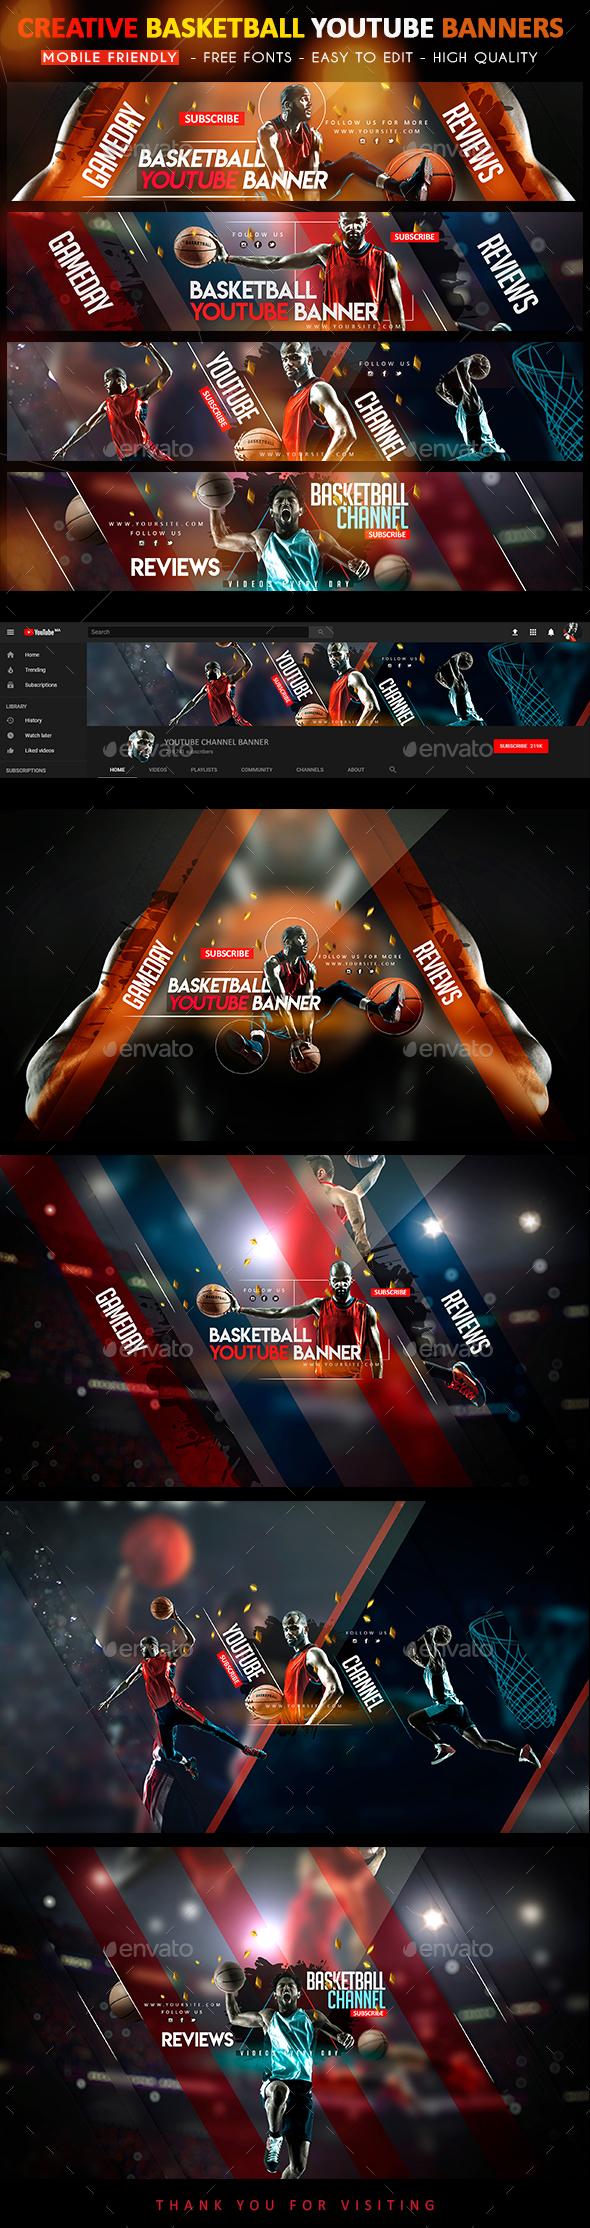 Creative Basketball YouTube Banners - YouTube Social Media